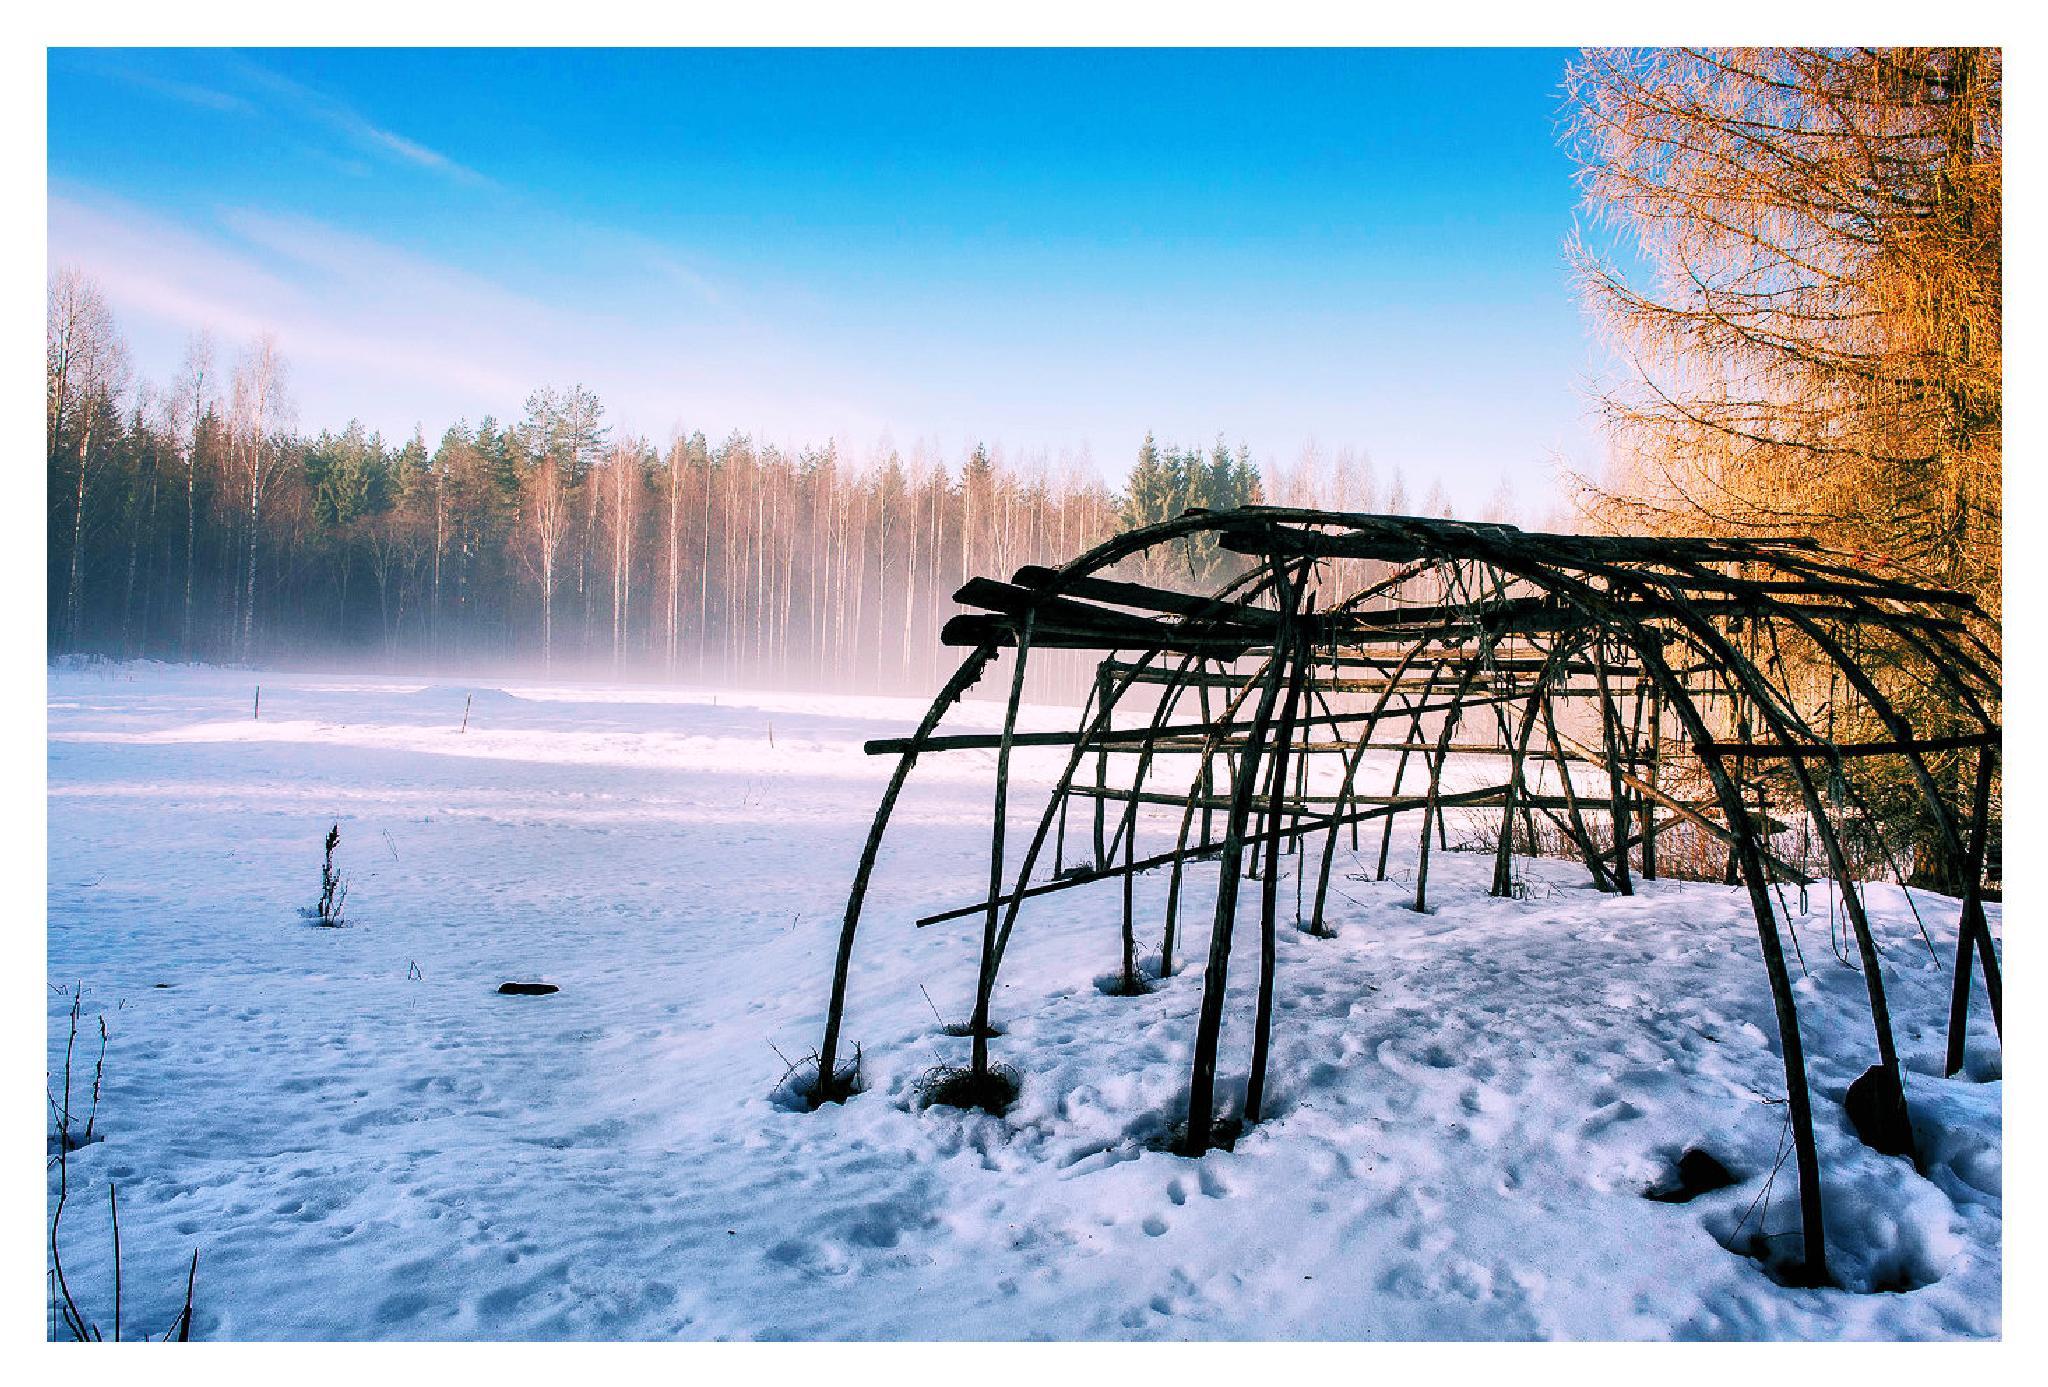 Fog on a Snowy Field by pekka ilari t